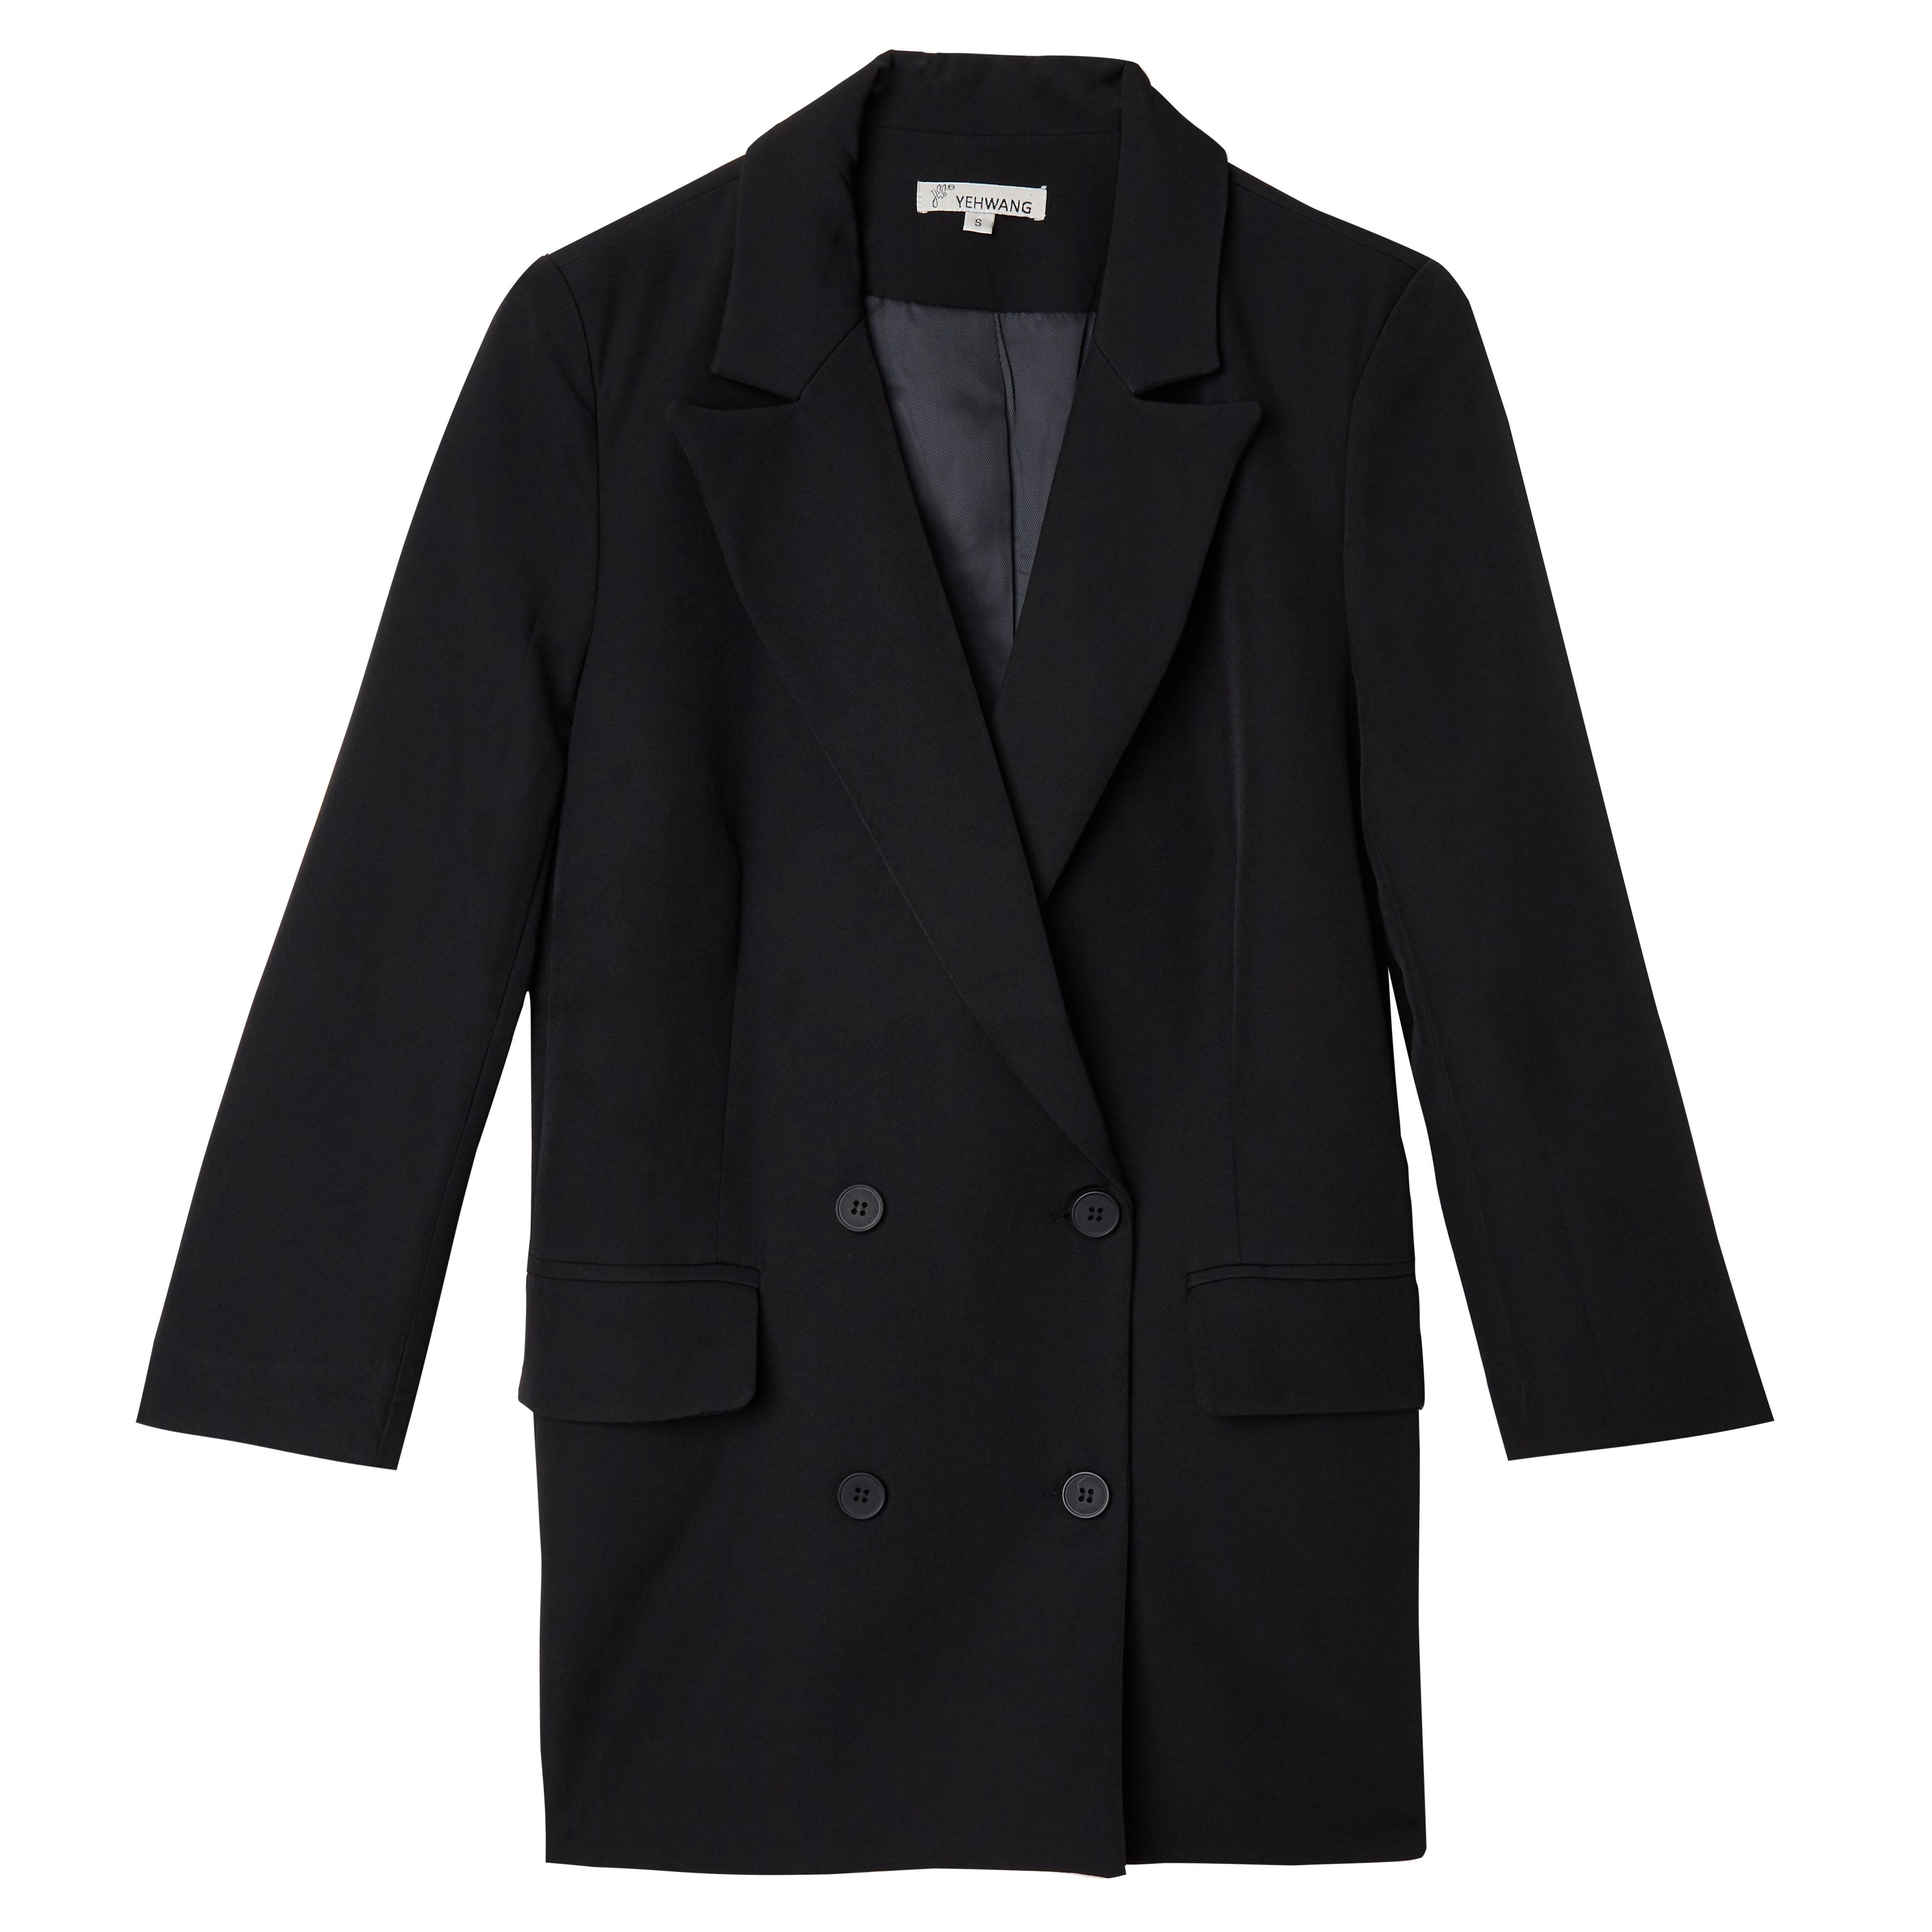 Blazer Suit Up